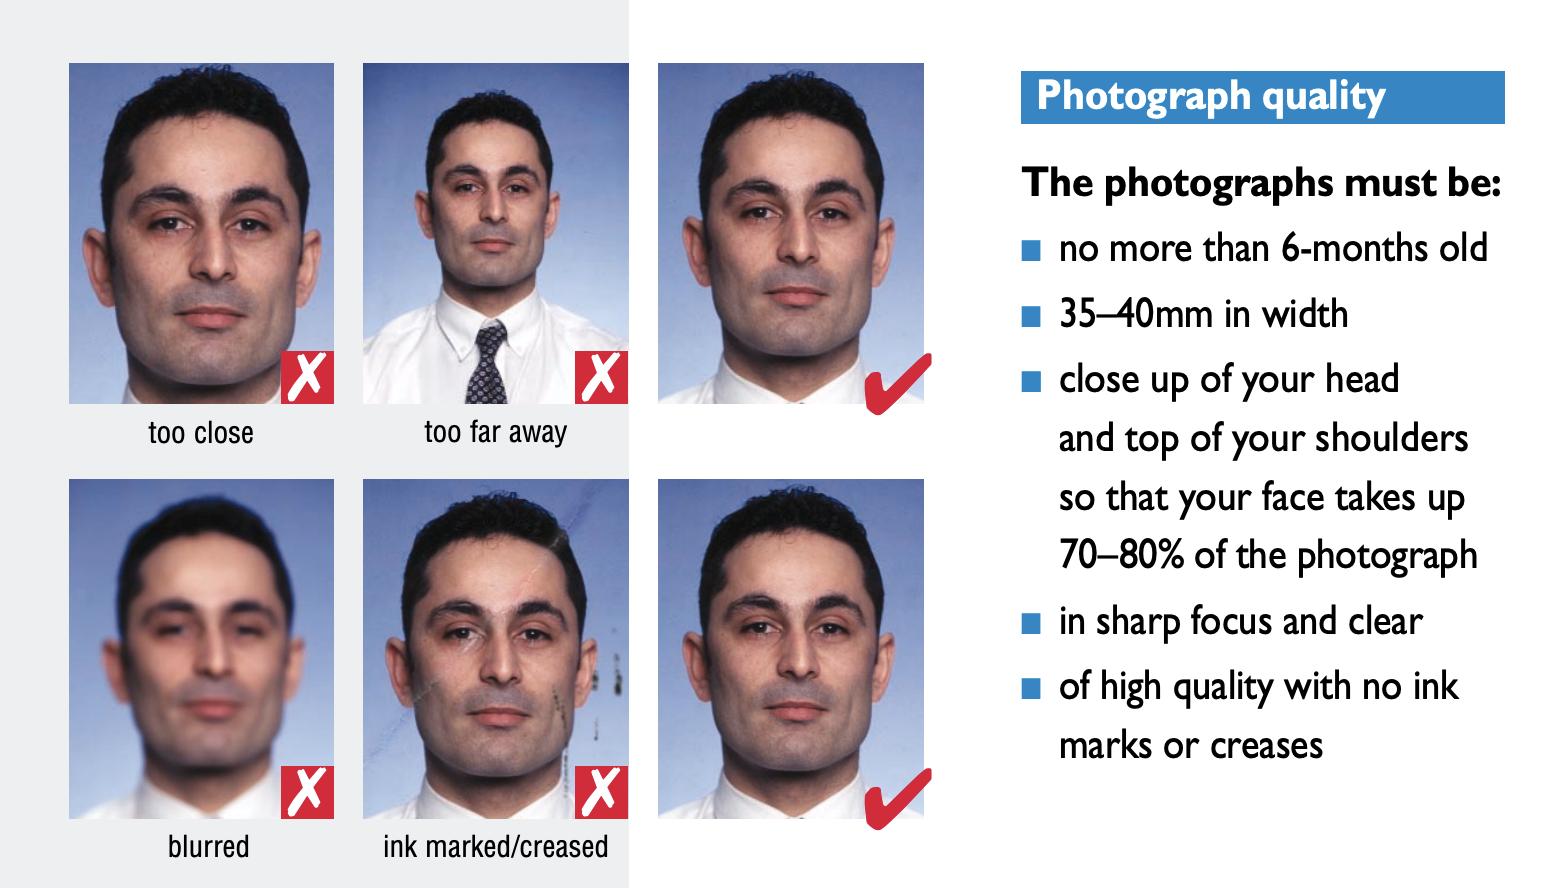 Passport photo requirements